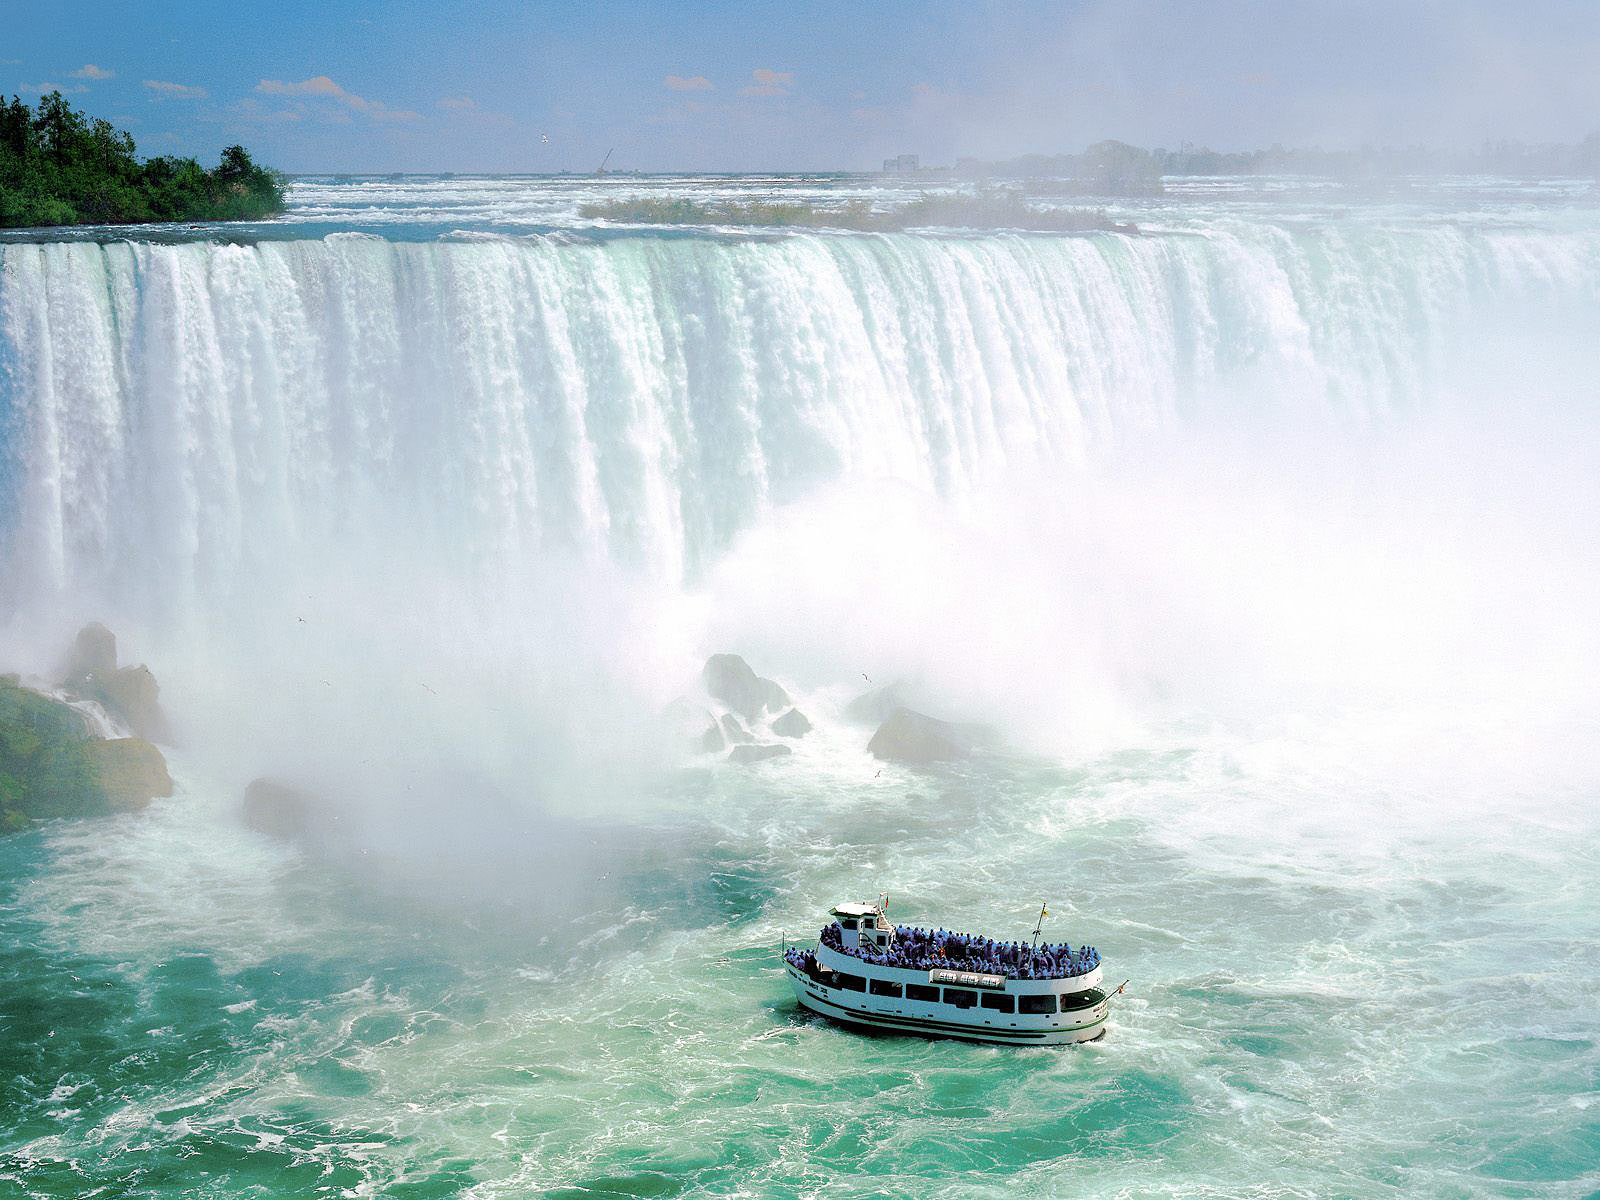 http://3.bp.blogspot.com/-fq-KpnIEg_A/TnnNt4T43uI/AAAAAAAANNU/LO0XIIPCyX0/s1600/Mooie-watervallen-achtergronden-hd-waterval-wallpapers-afbeelding-foto-1.jpg